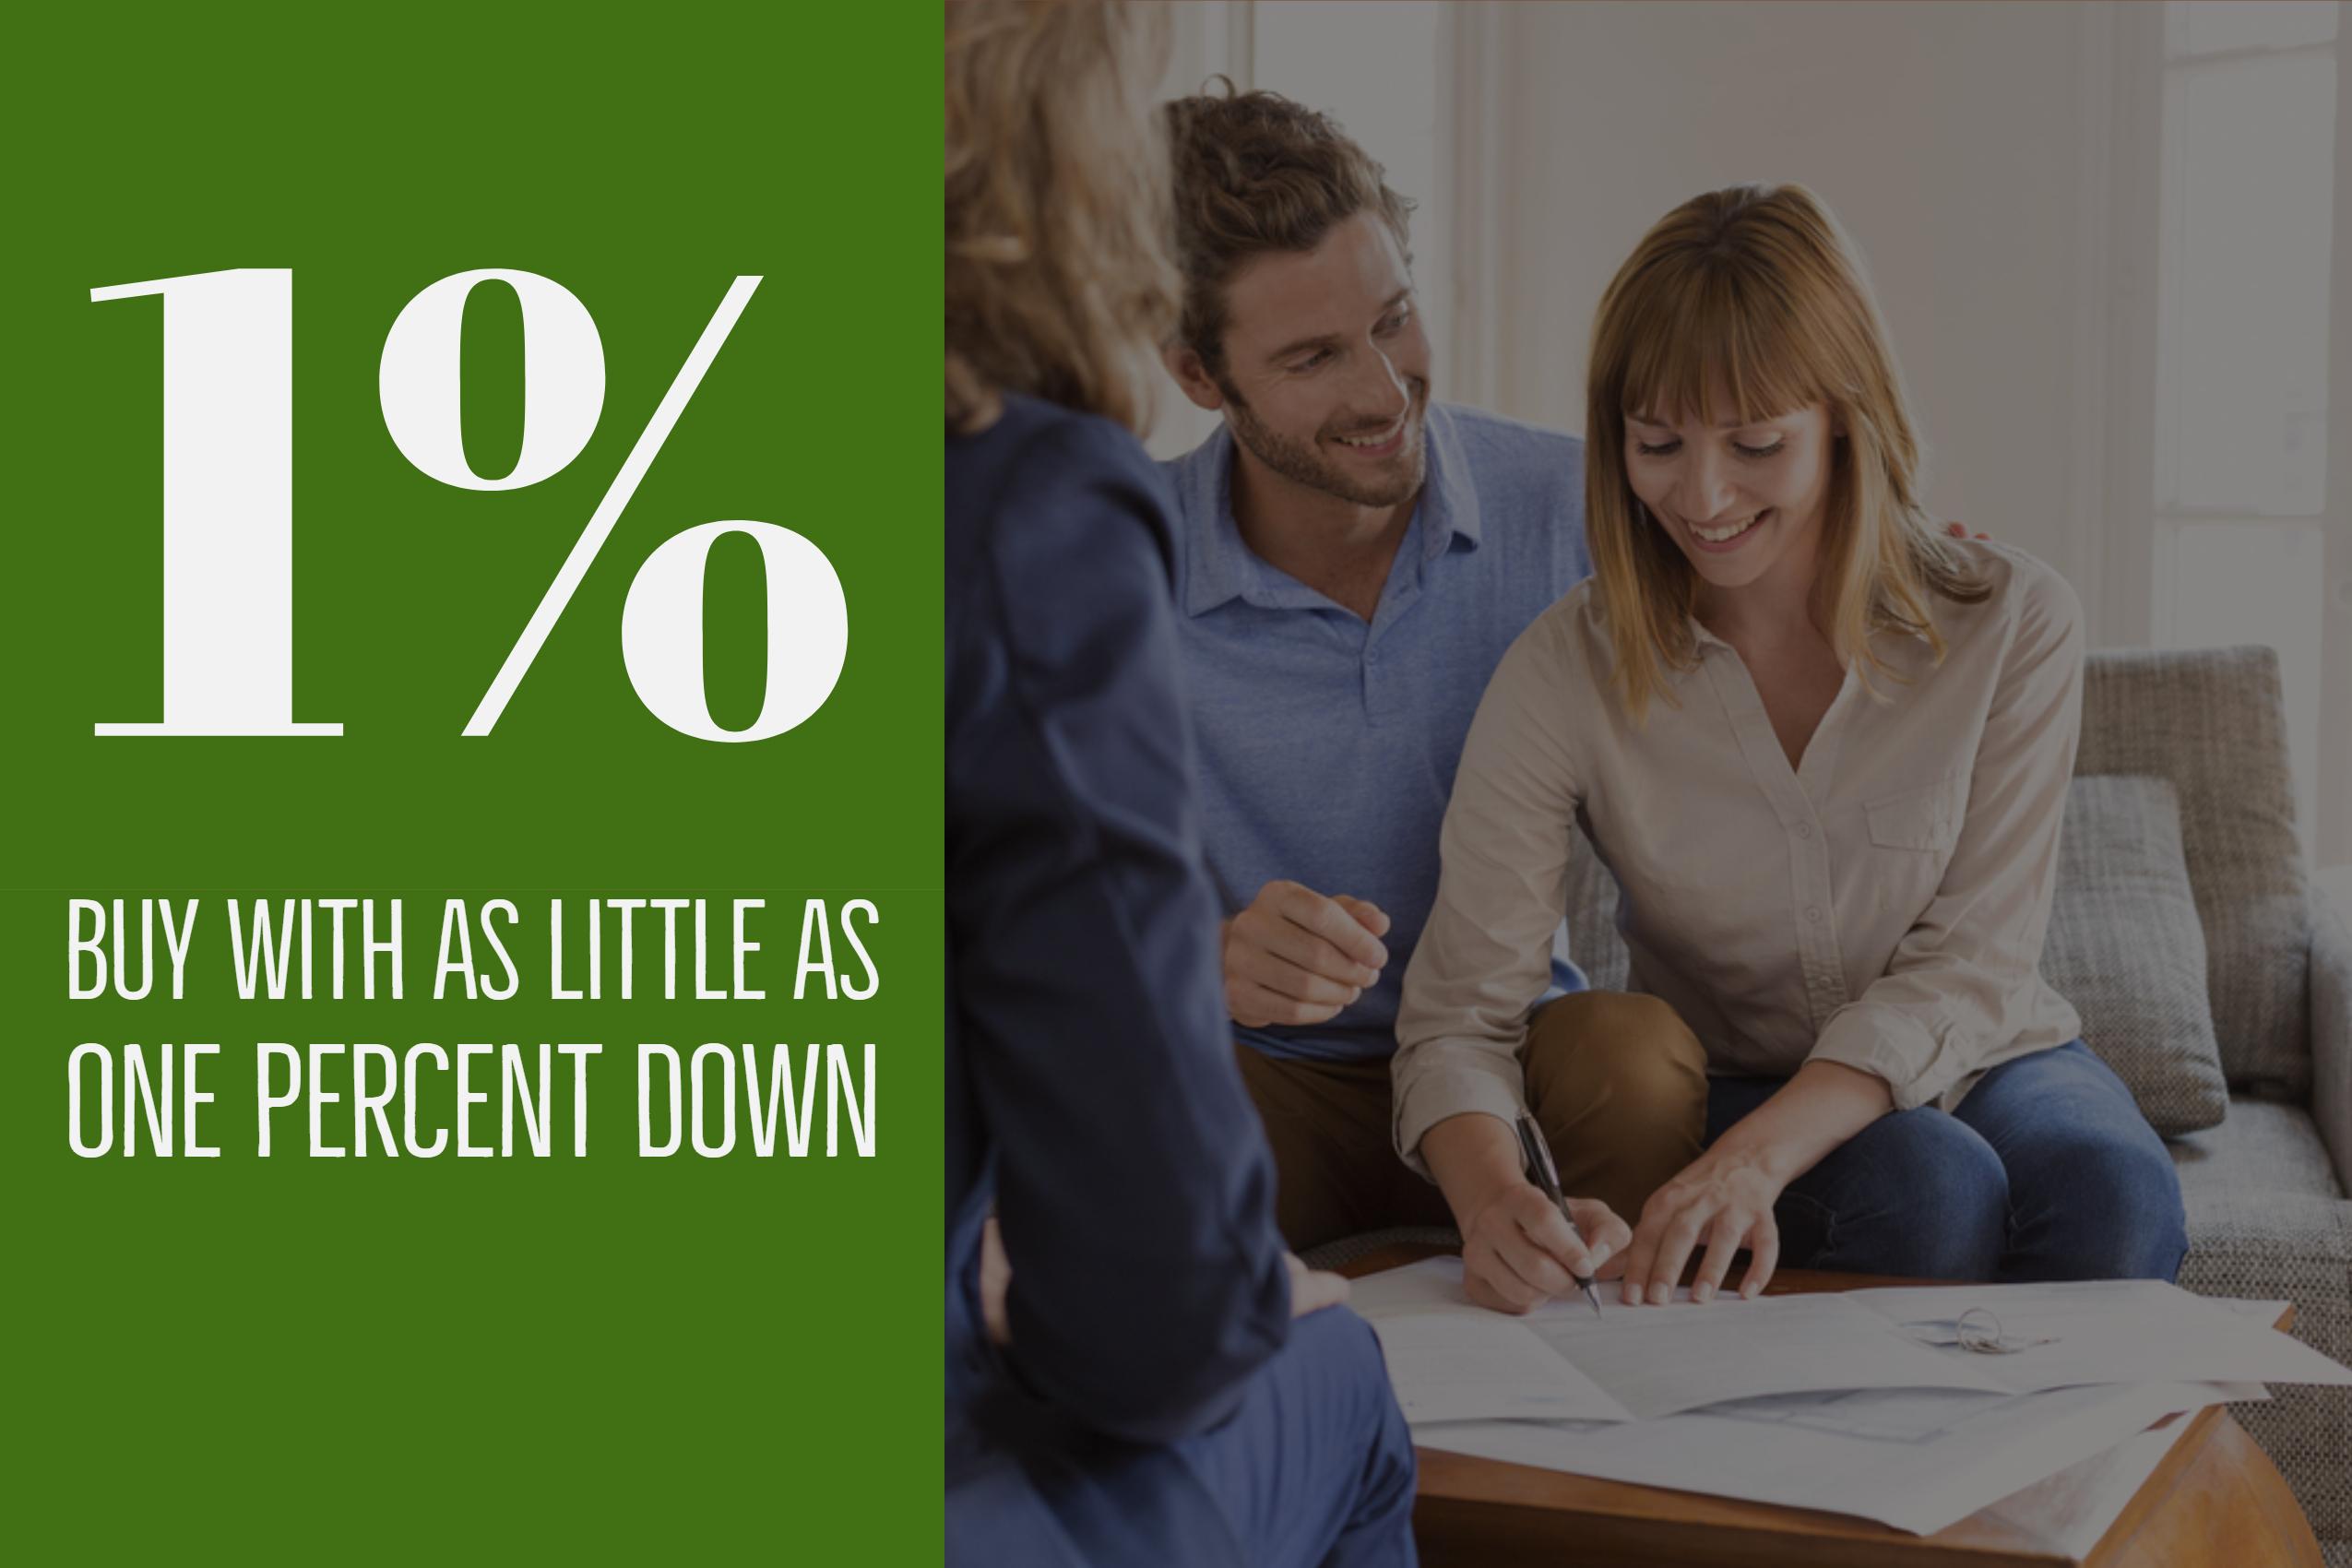 home-equity-loan-heloc-refinance-your-home-talktopaul-mortgageheaven